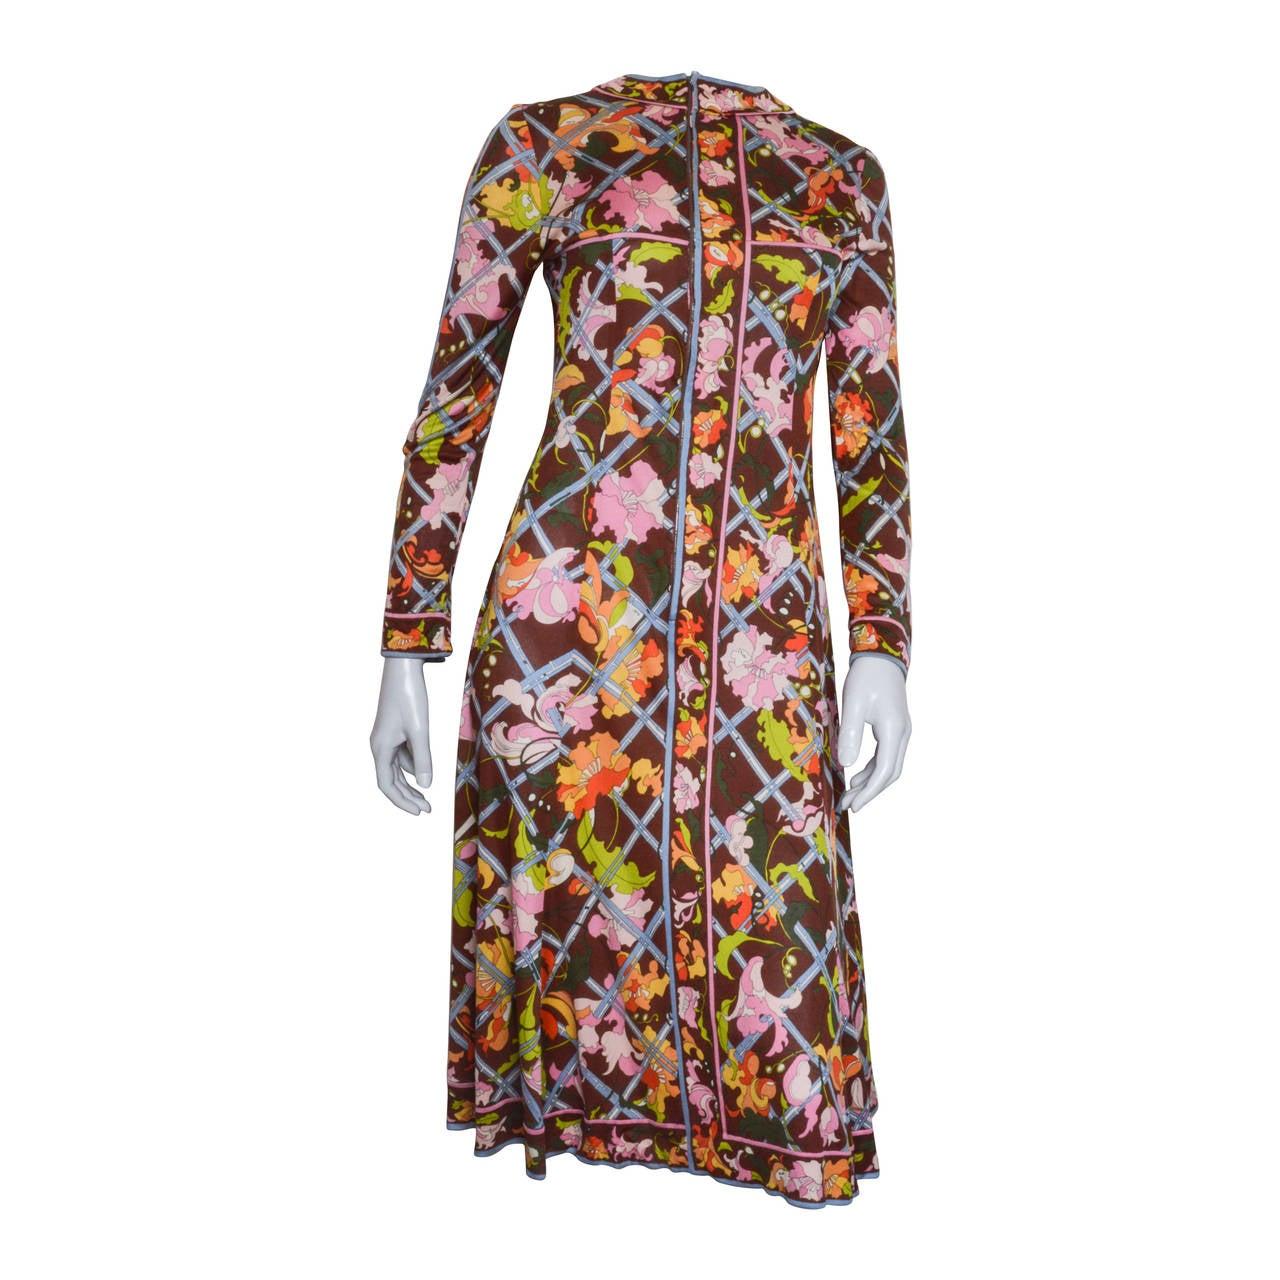 Emilio Pucci Brown Floral Print Silk Dress